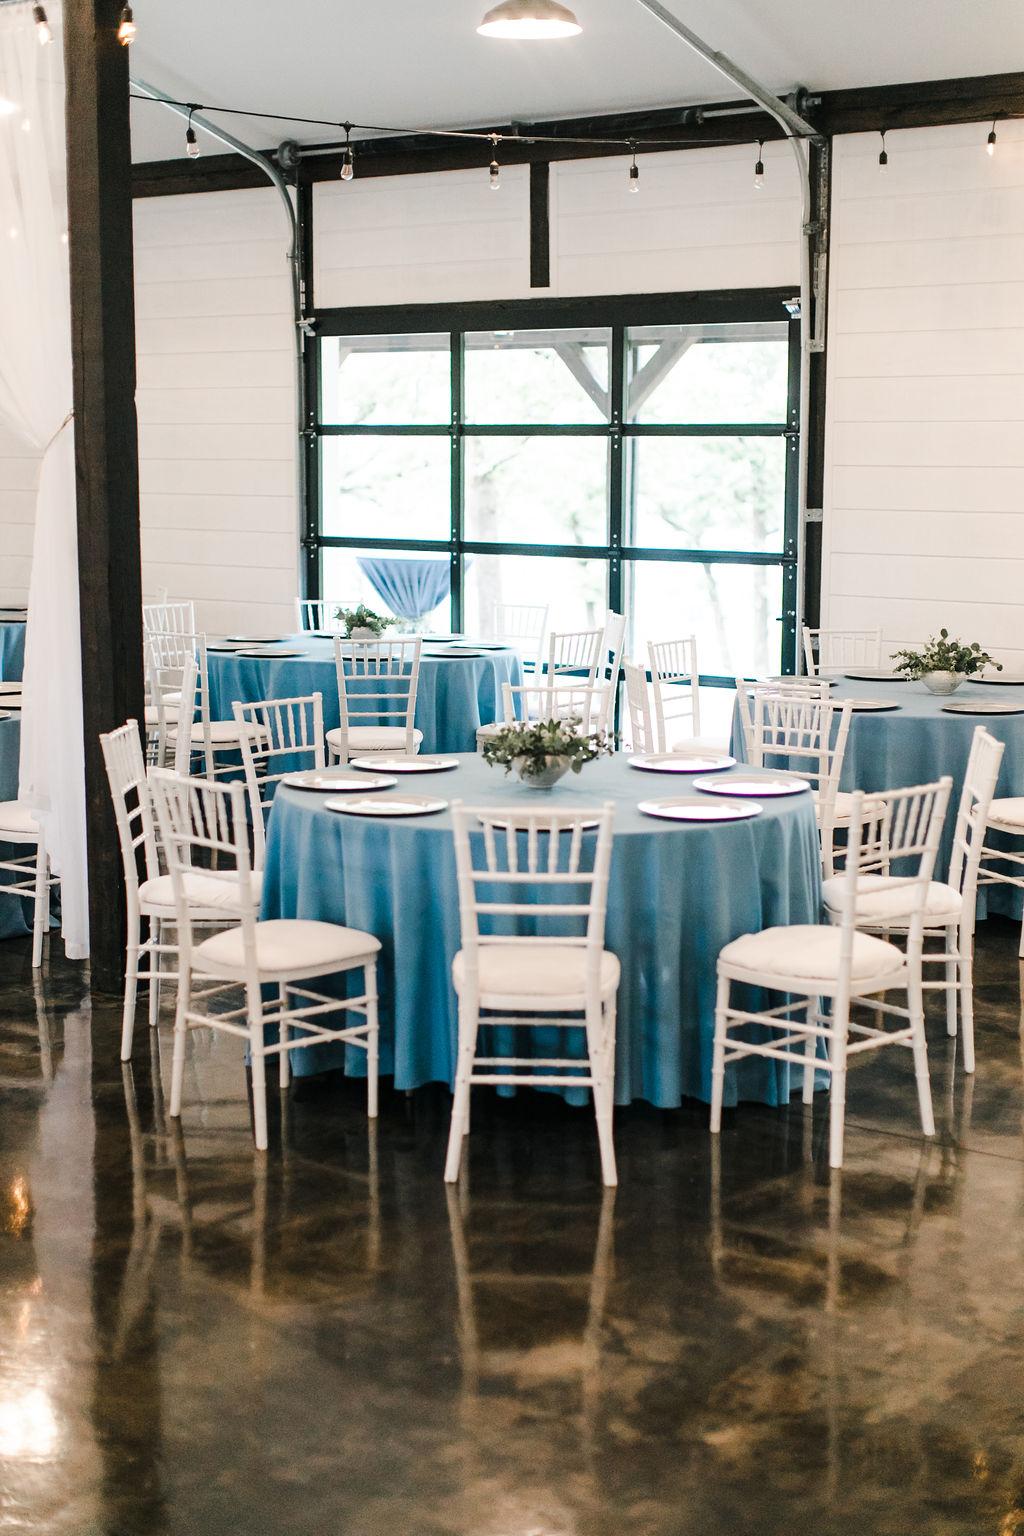 Dream Point Ranch Tulsa's White Barn Wedding Venue 1.jpg